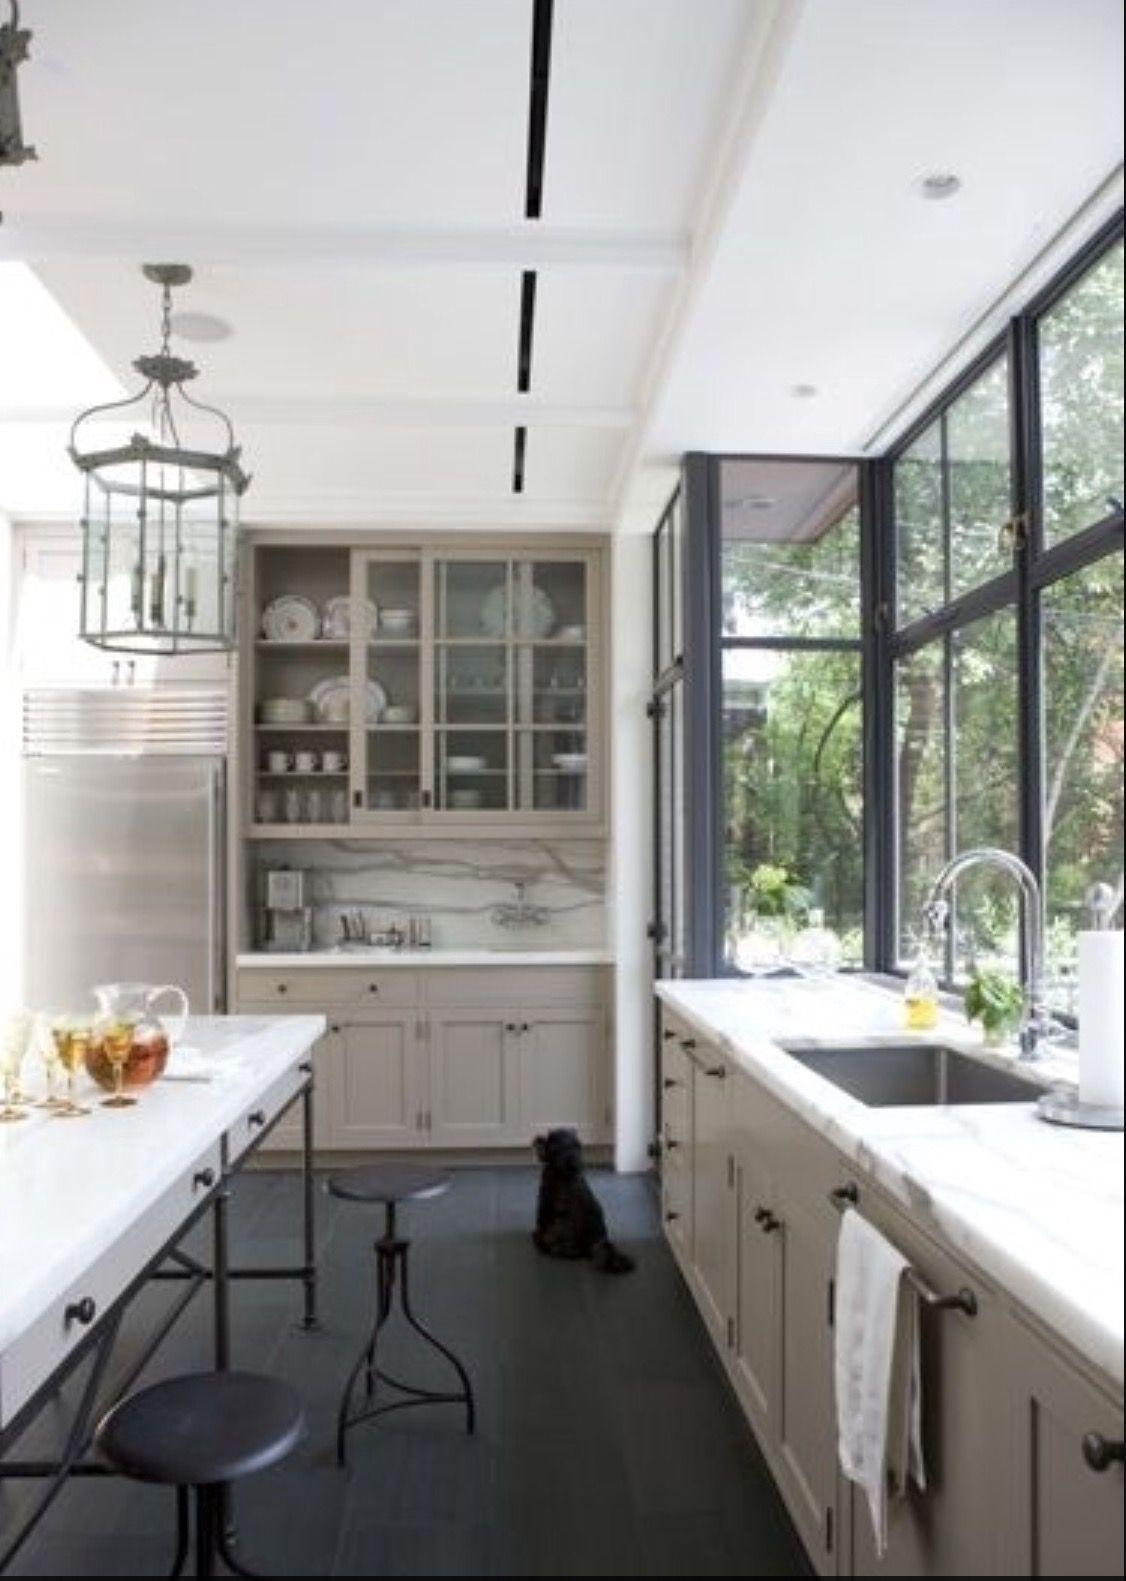 Sliding window over kitchen sink  pin by tabatha collins on kitchens  pinterest  kitchens